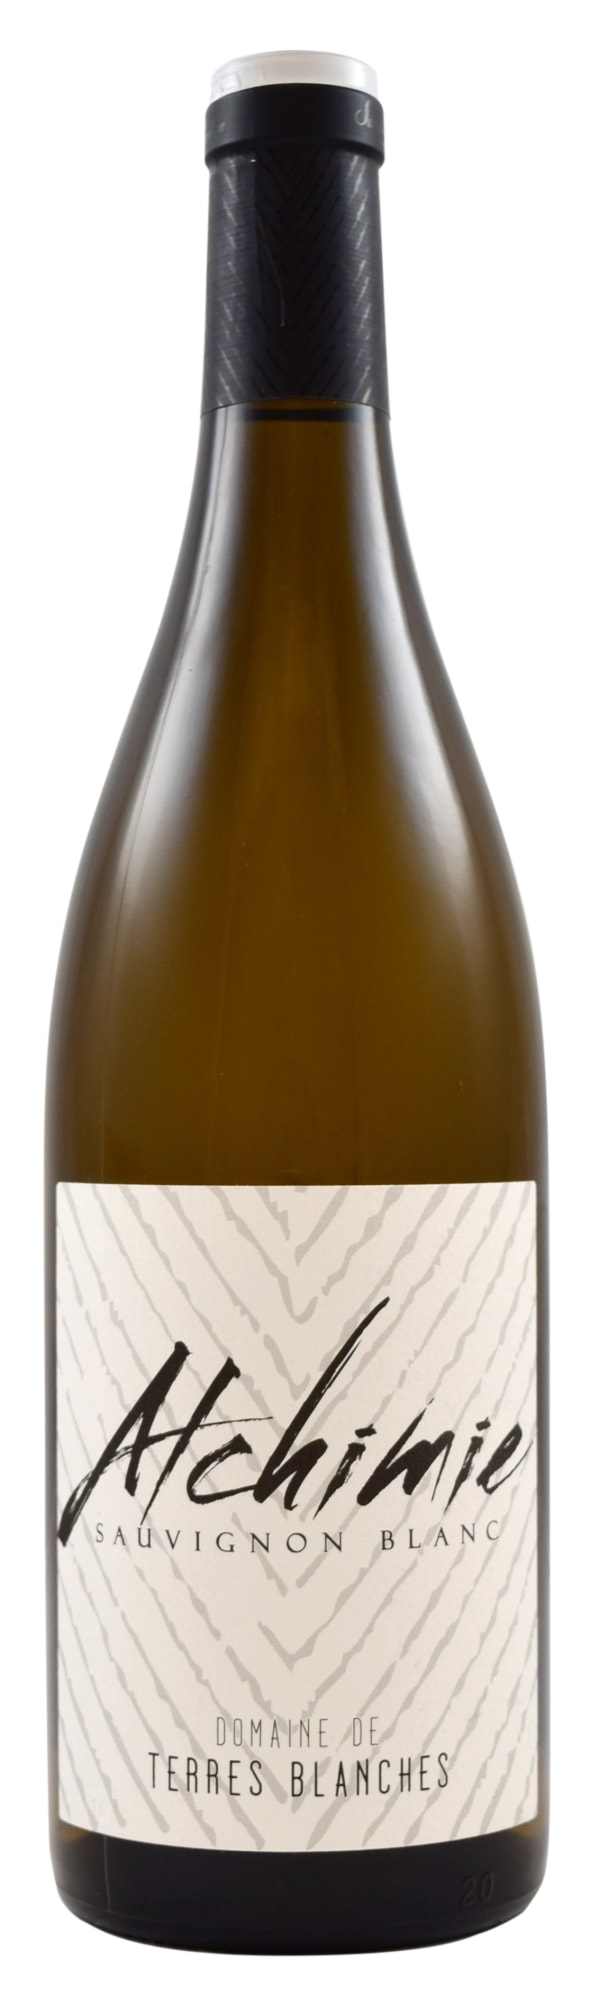 Alchimie Sauvignon Blanc 2015